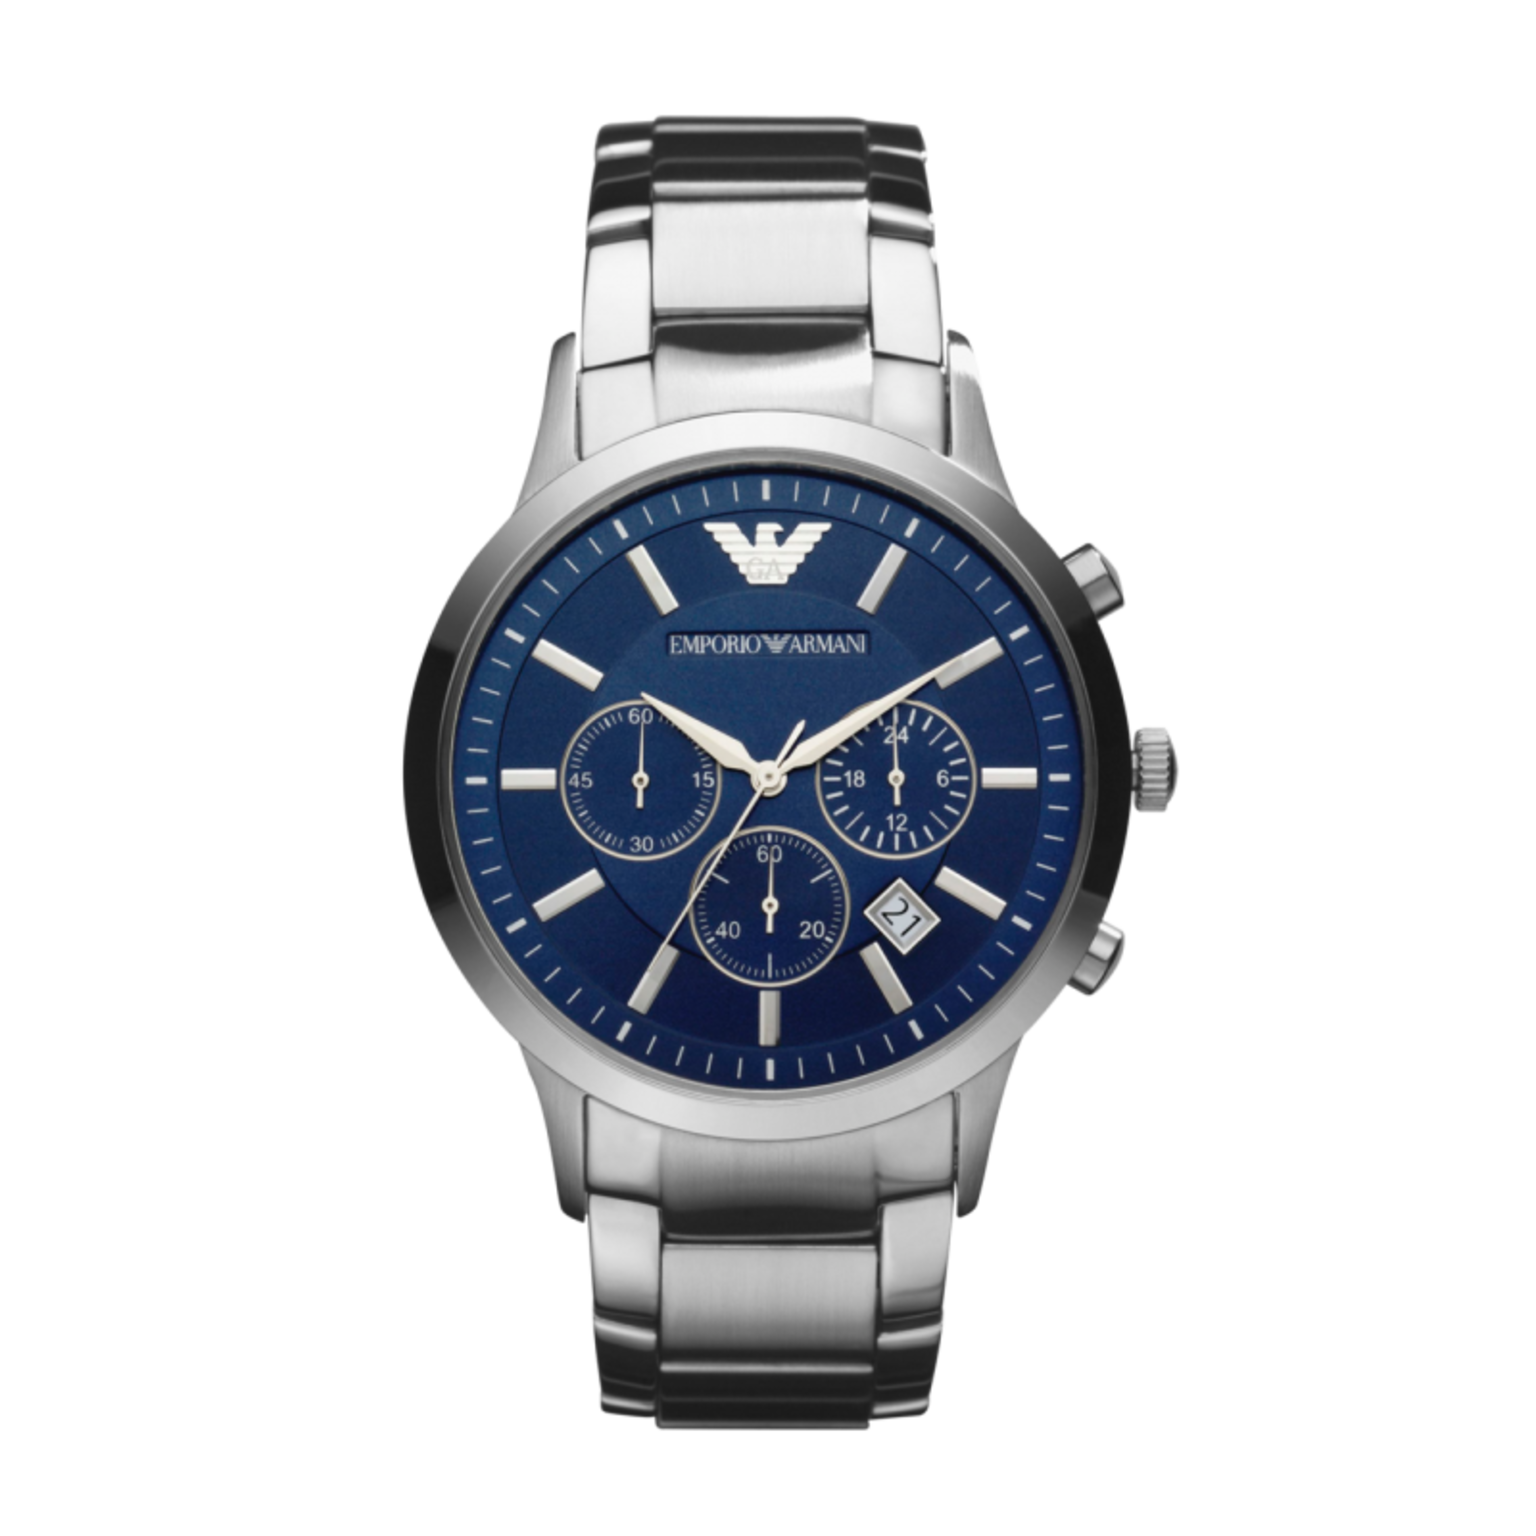 Emporio Armani Chronograph watch